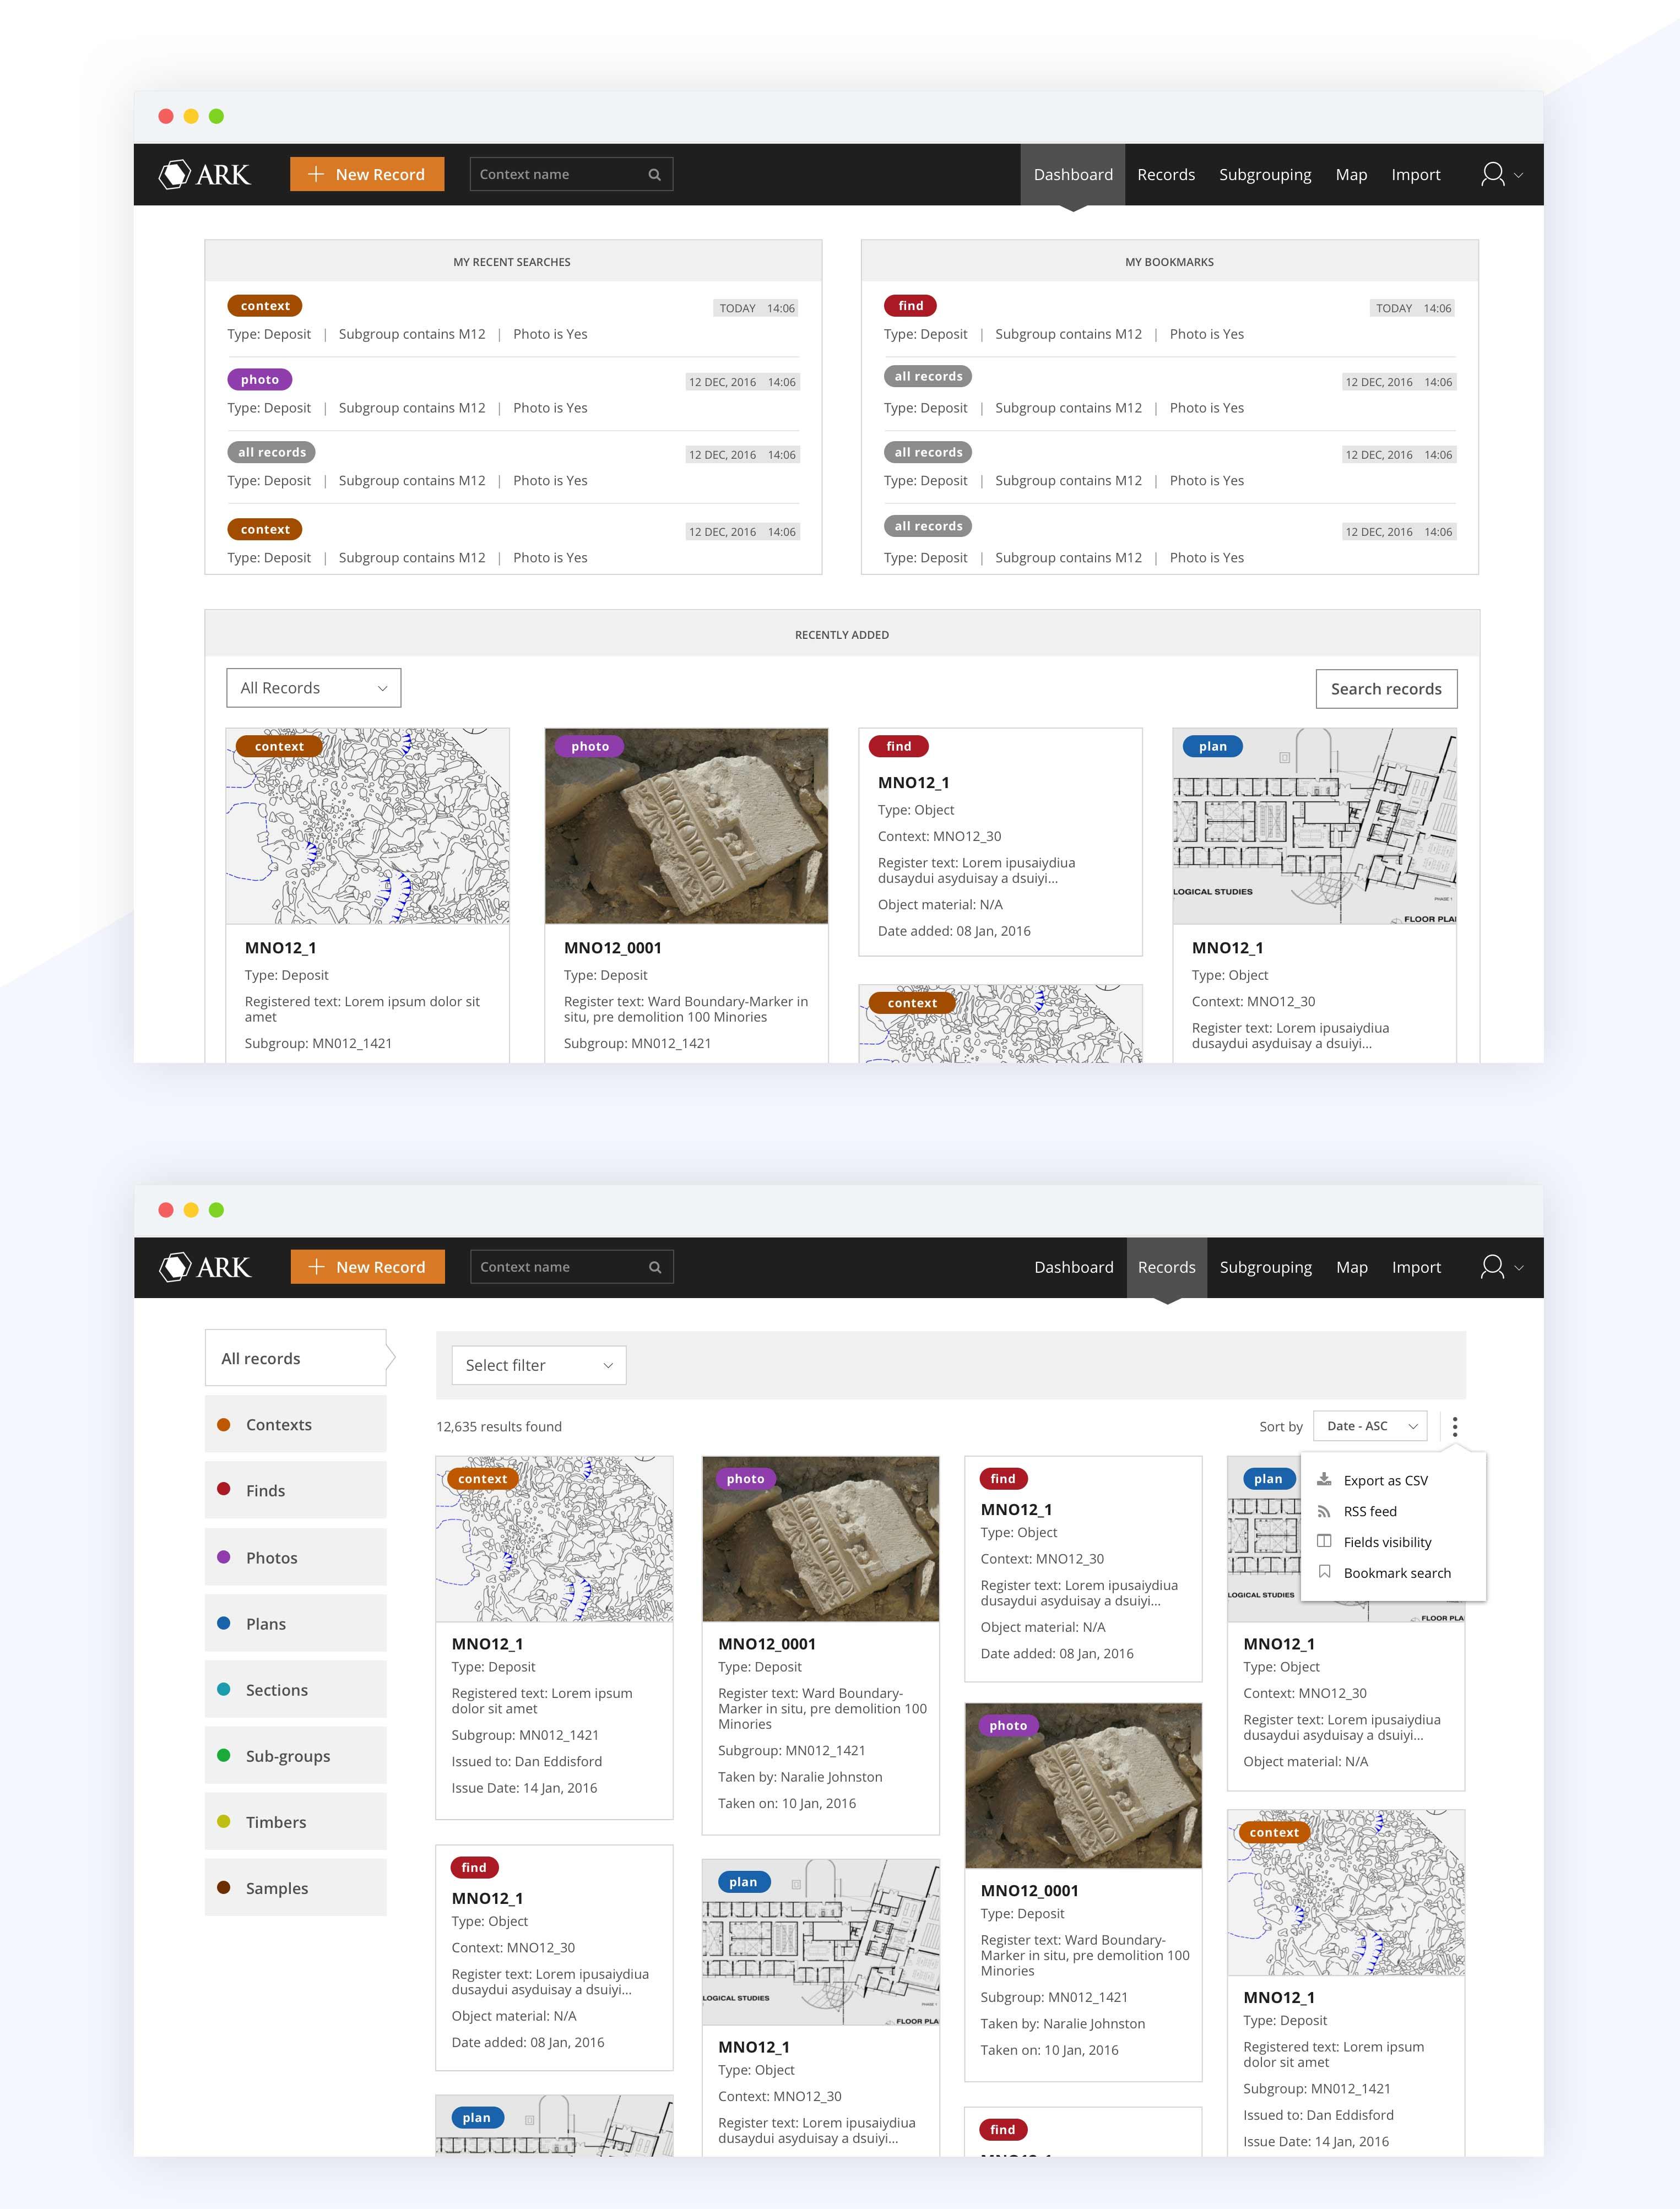 UI Mockup for dashboard